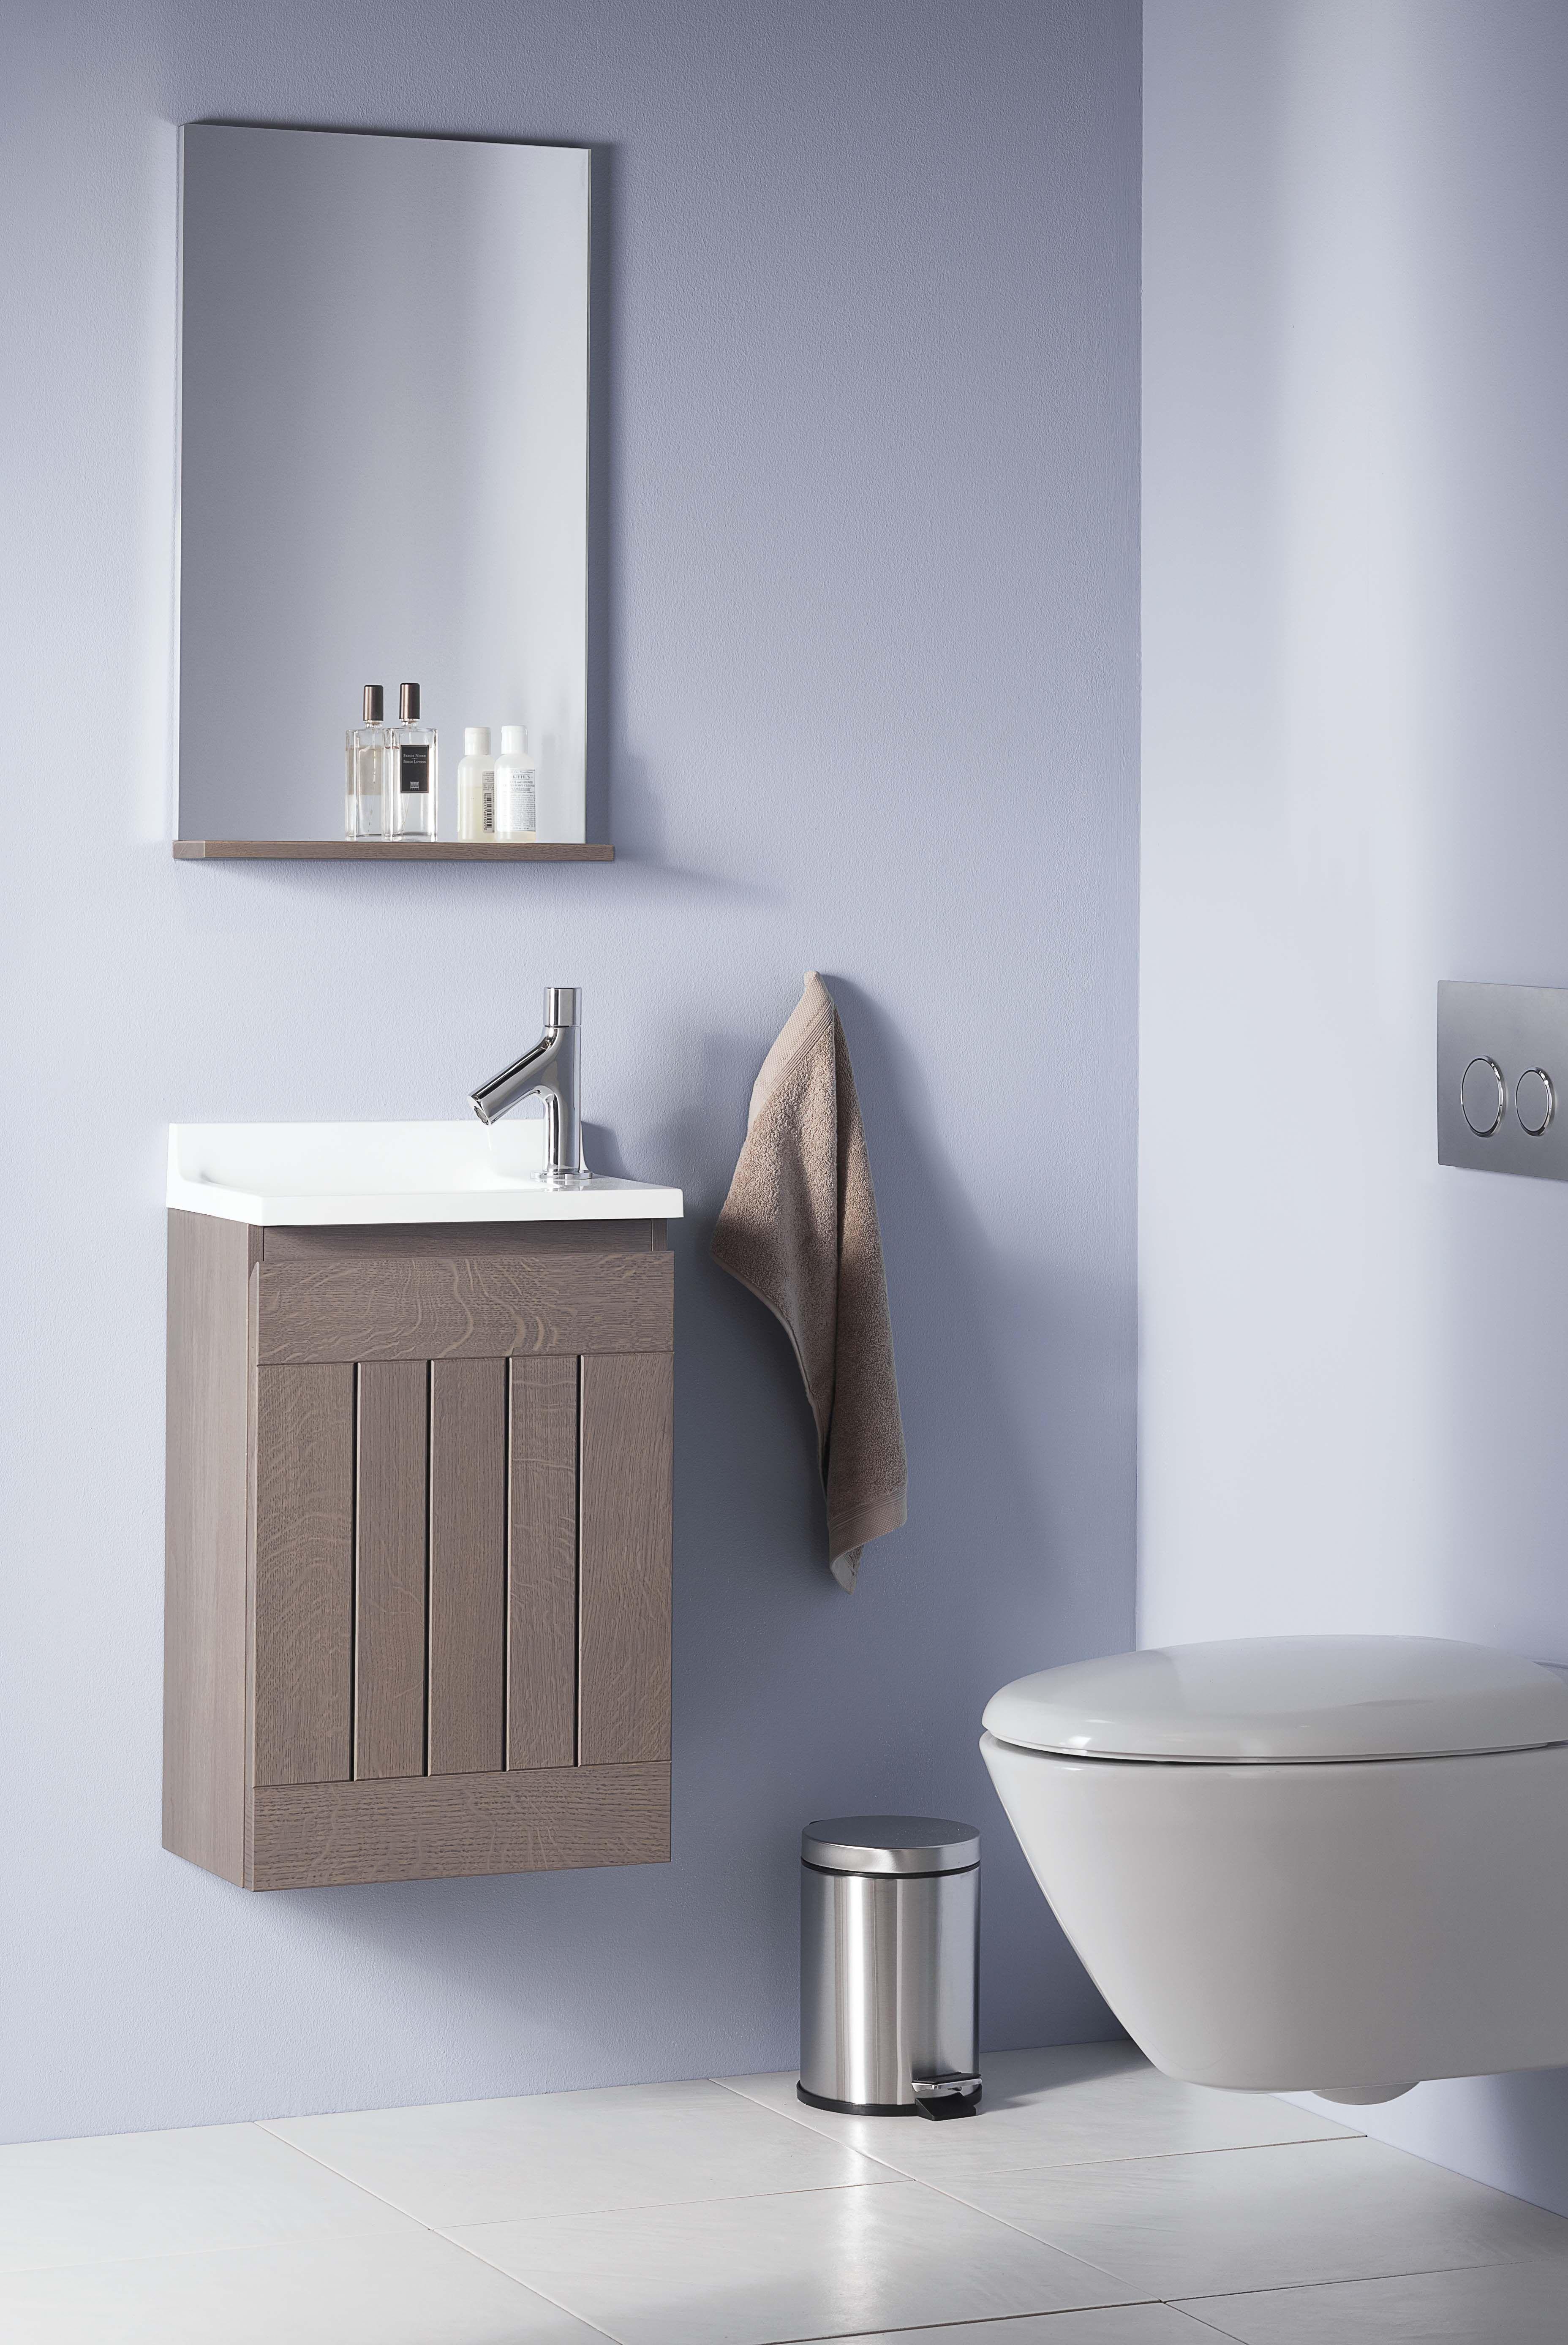 Sanijura Pop Massif Single Vanity Bathroom Vanity Vanity